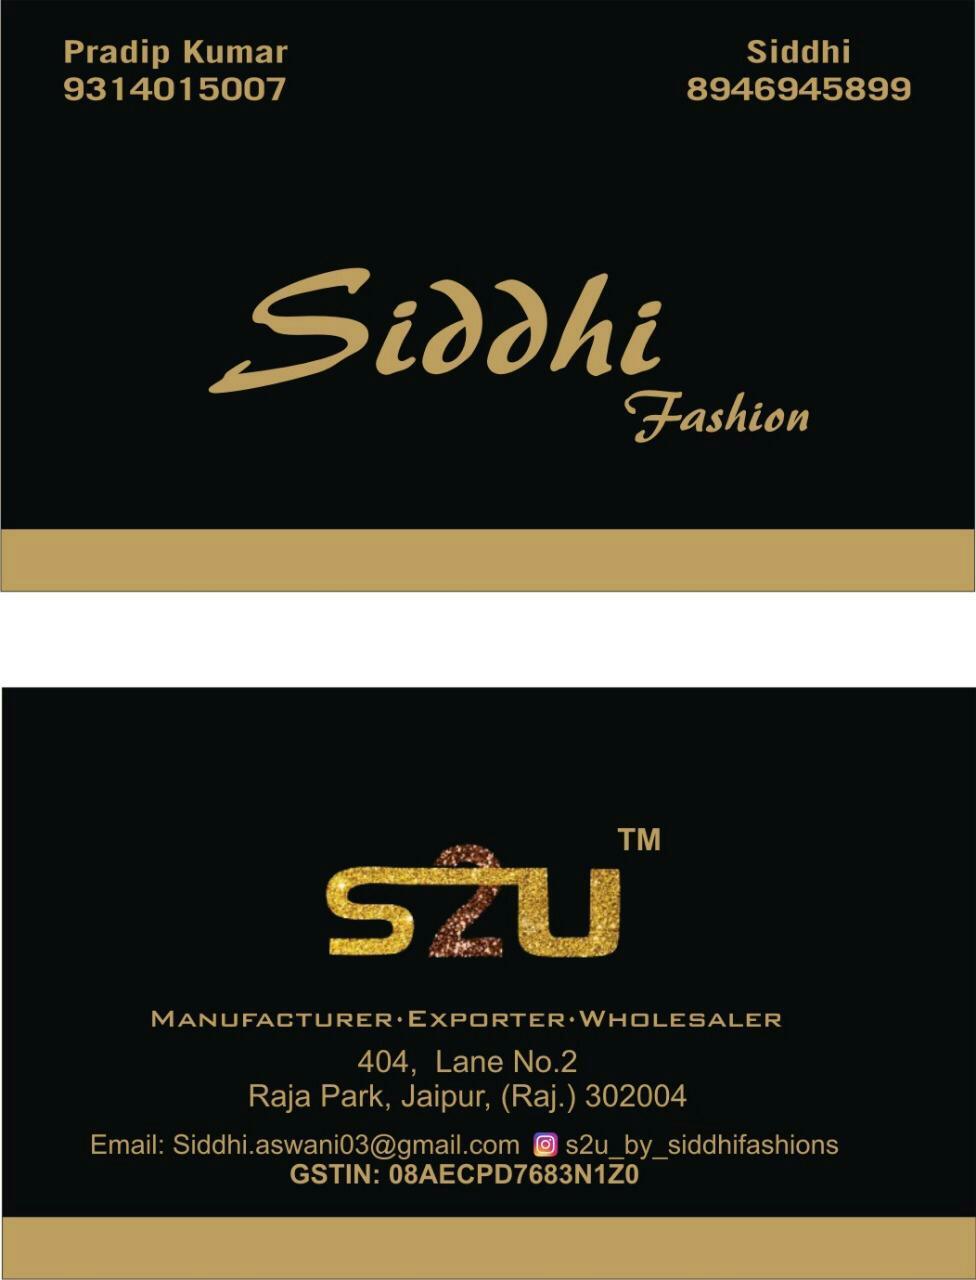 Siddhi Fashion & Tailoring